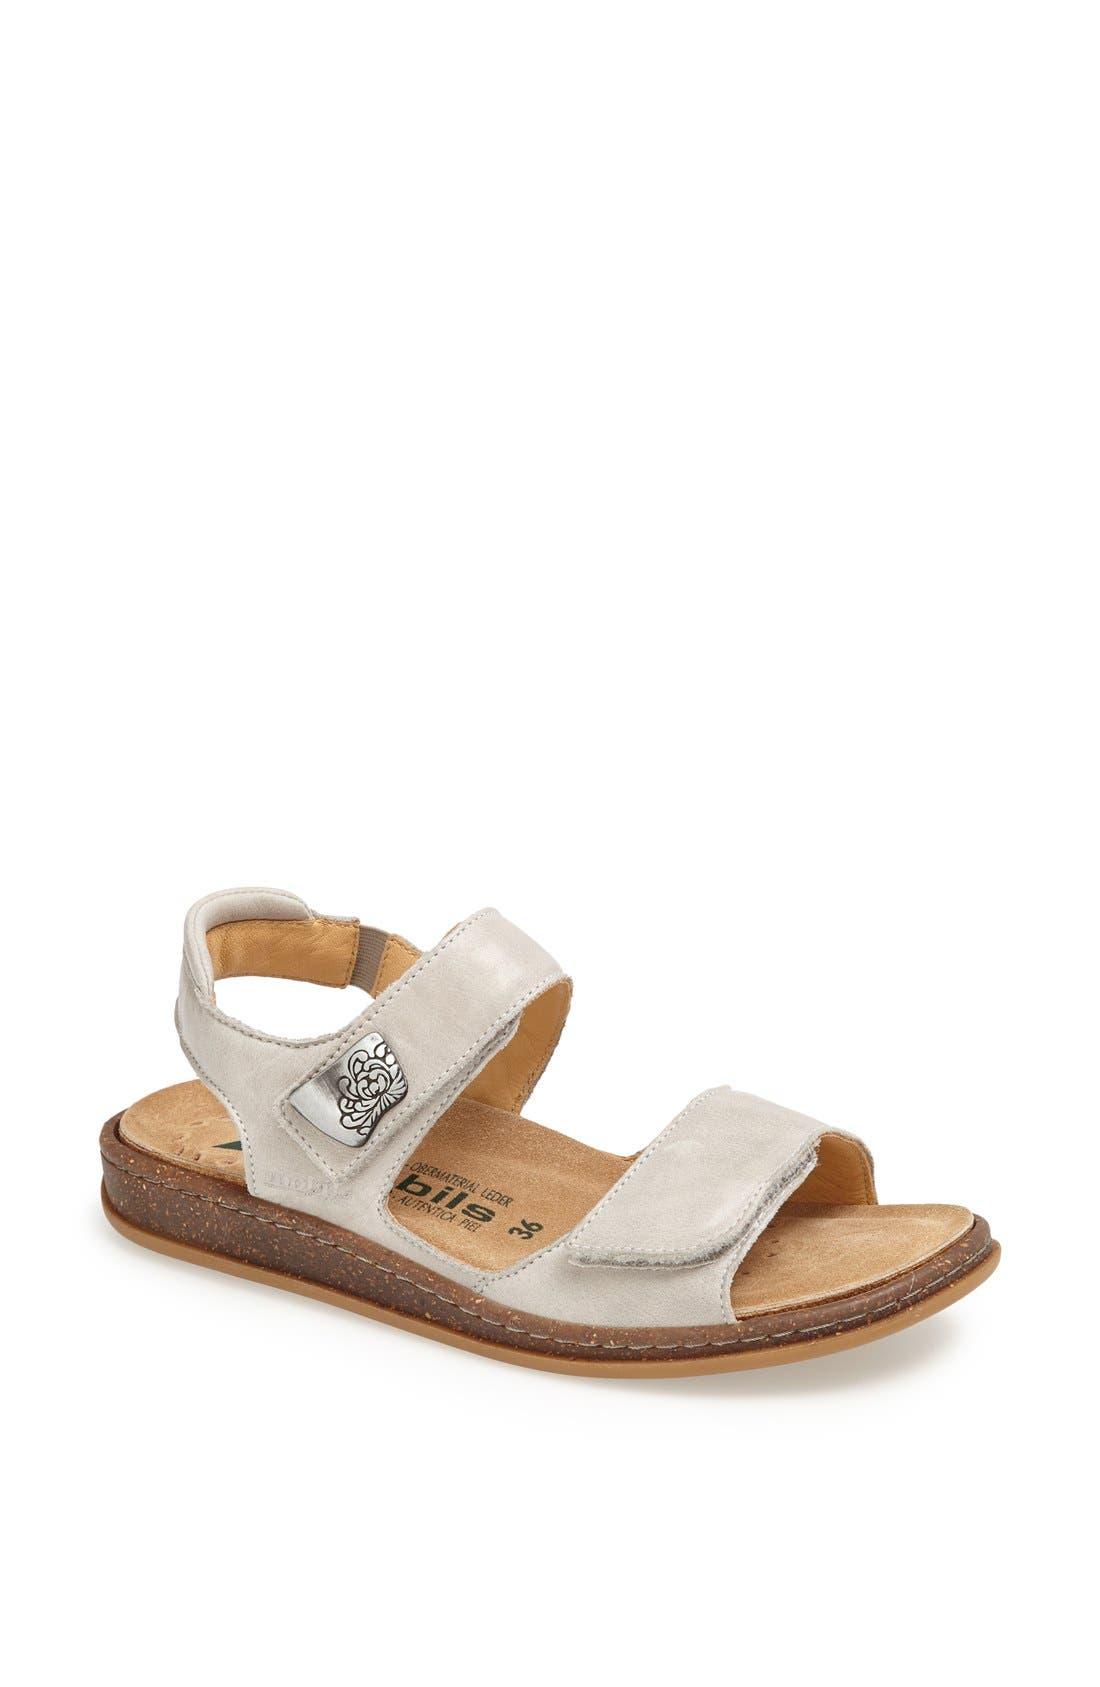 Main Image - Mephisto 'Qennie' Sandal